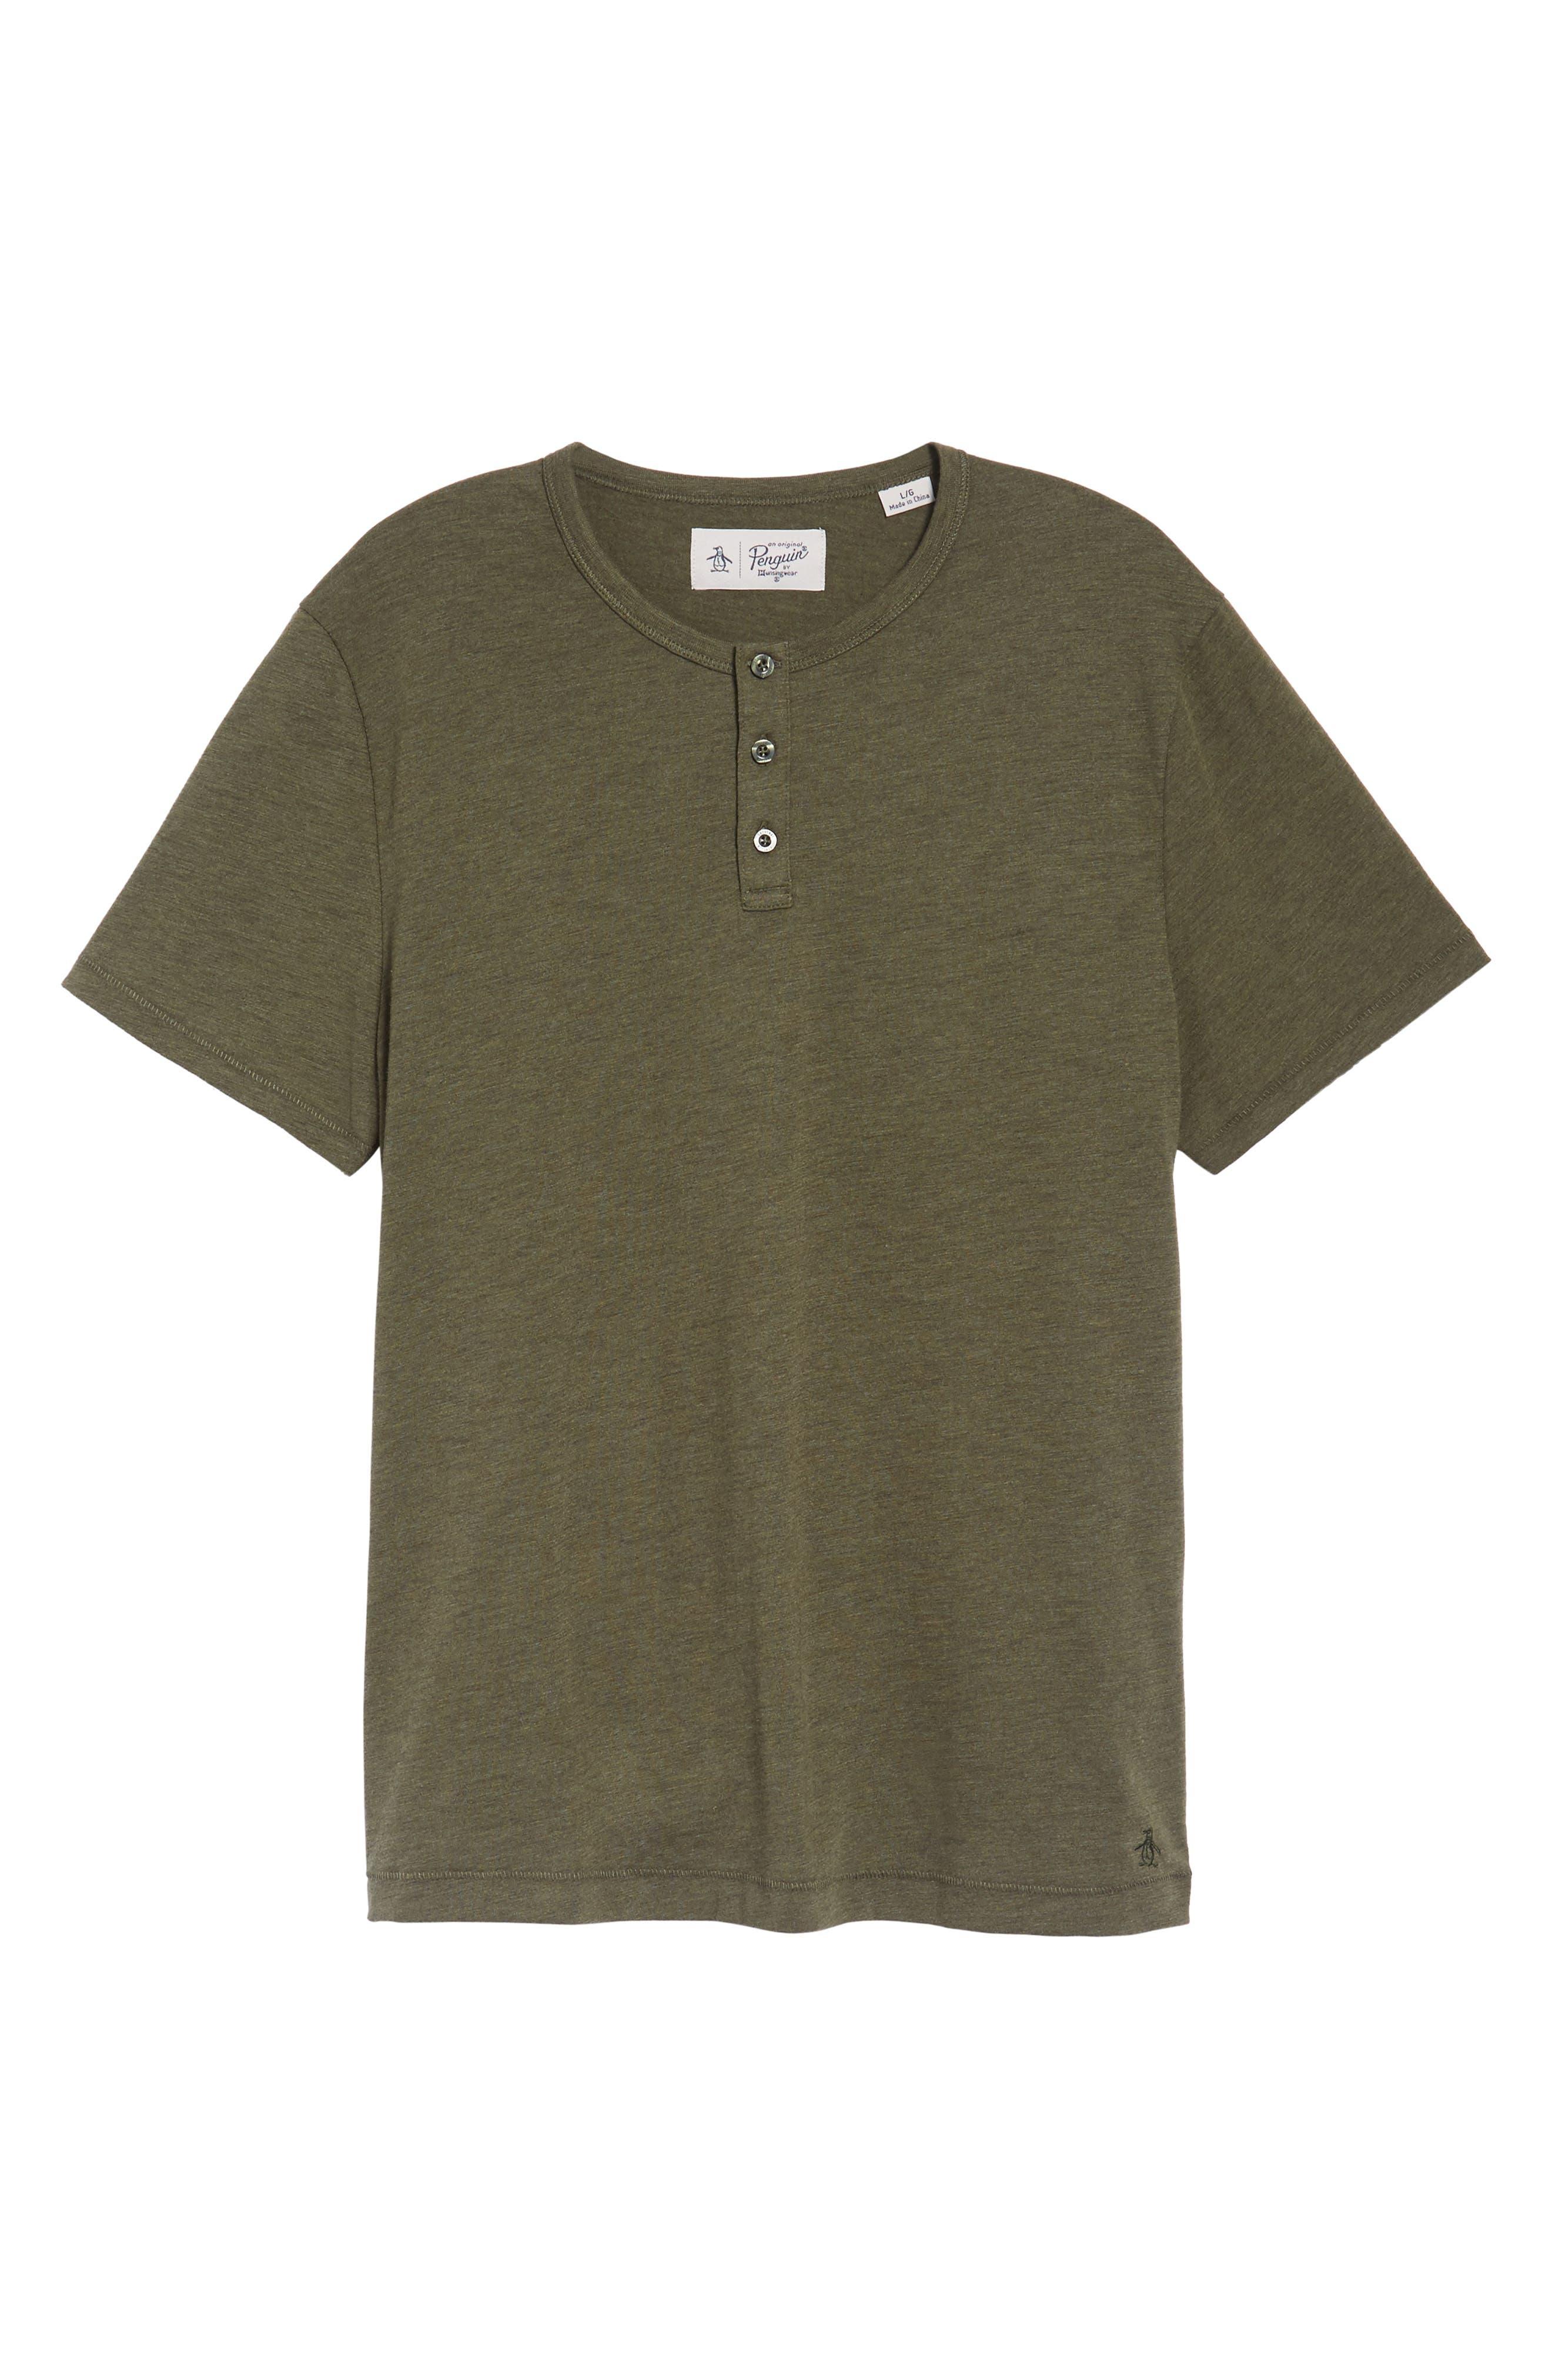 Bing Short Sleeve Henley Shirt,                             Alternate thumbnail 6, color,                             306